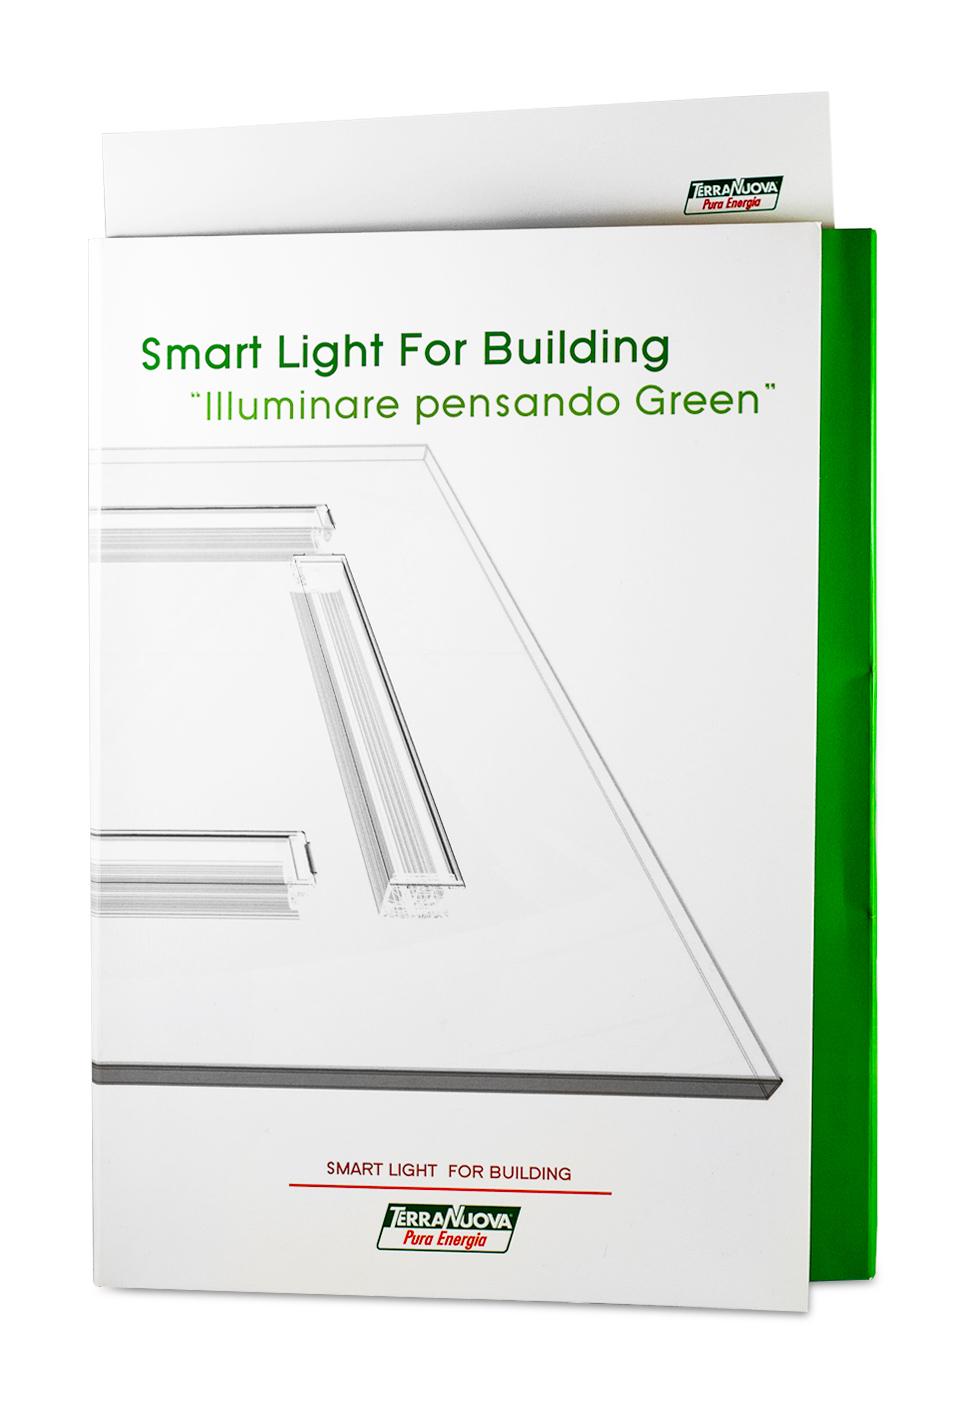 Folder-Schede-Smart-Light-For-Building_Consorzio-Terranuova-1